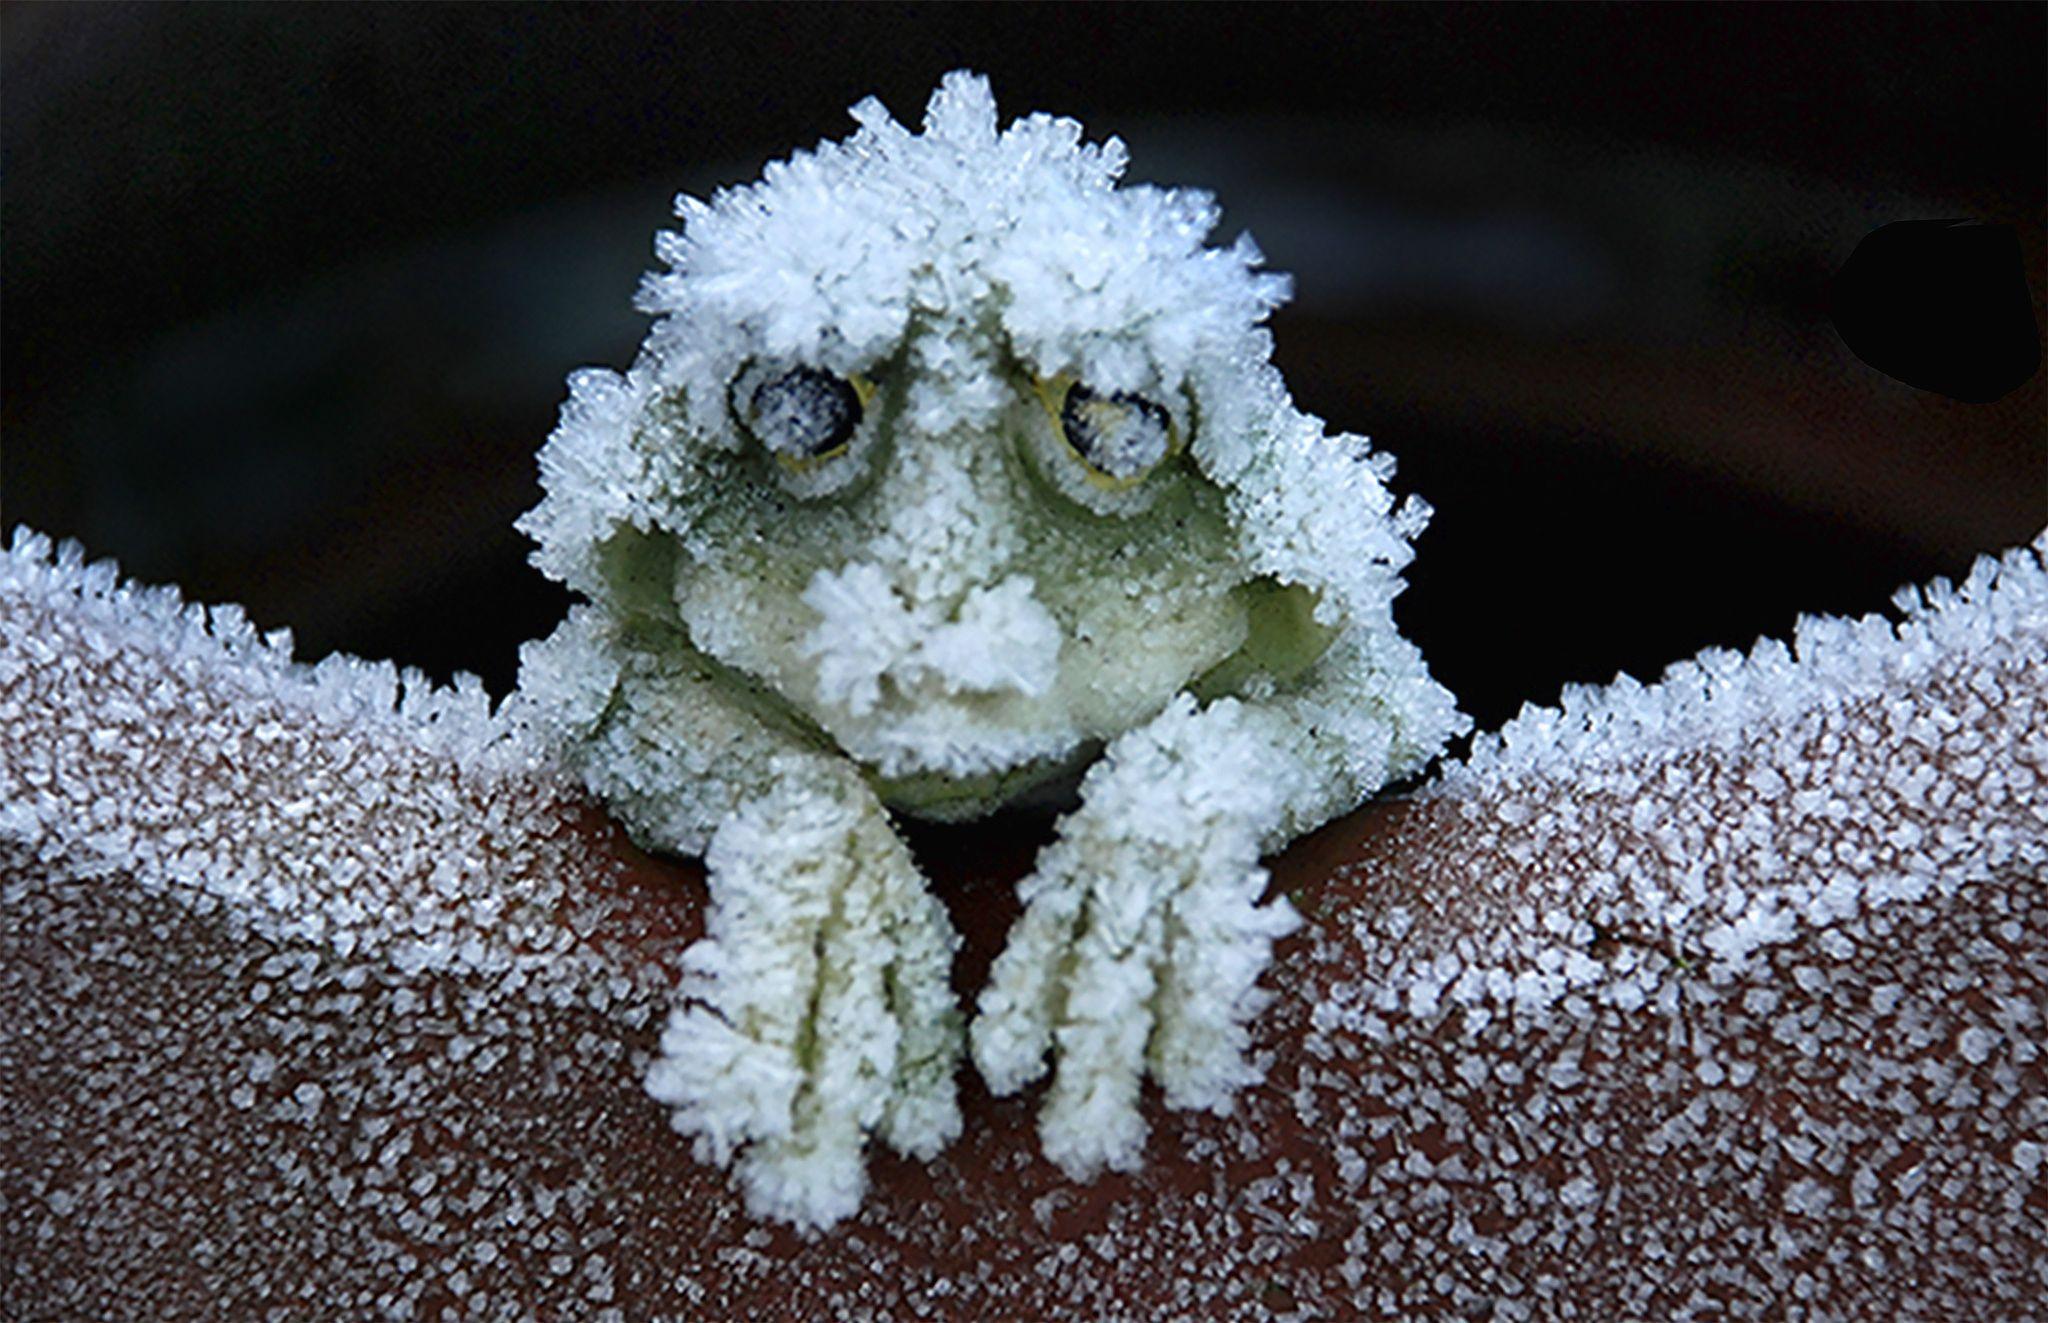 500px 上の Ann  の写真 I'm so cold